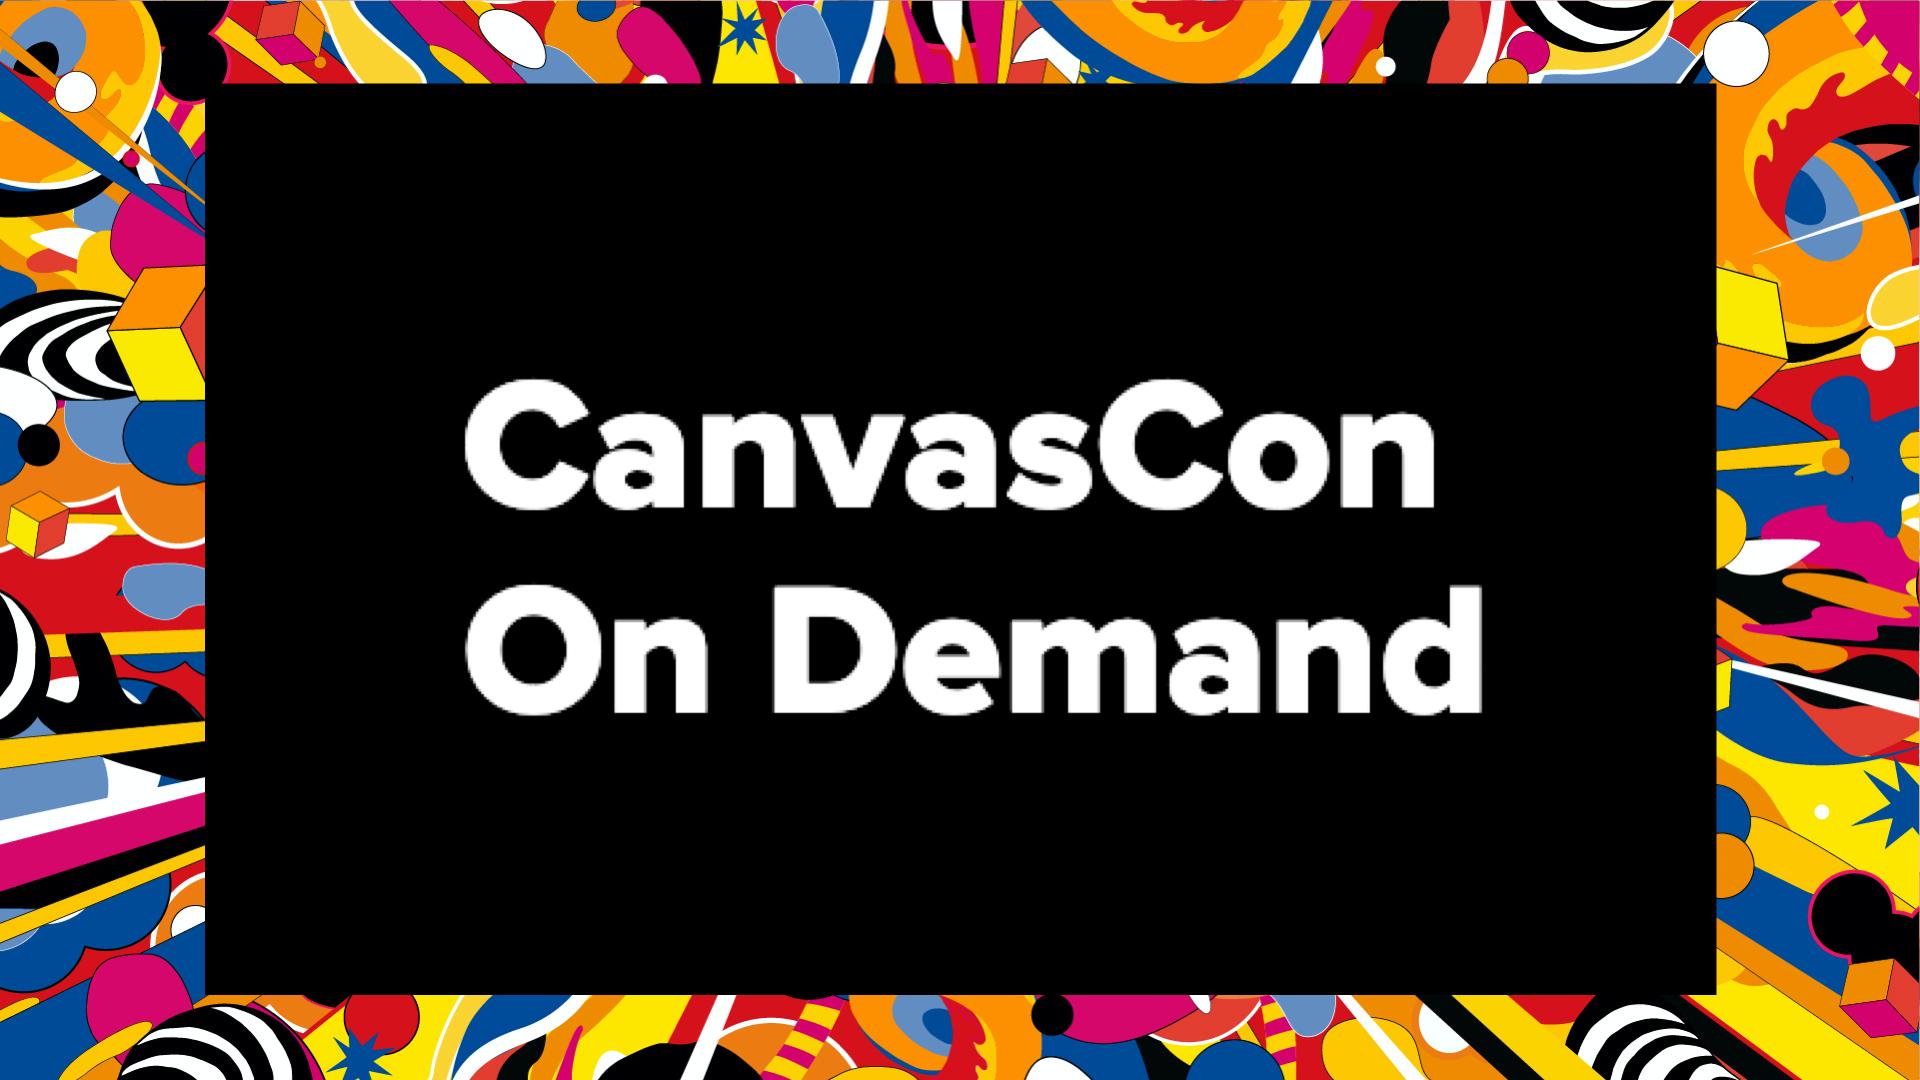 CanvasCon On Demand